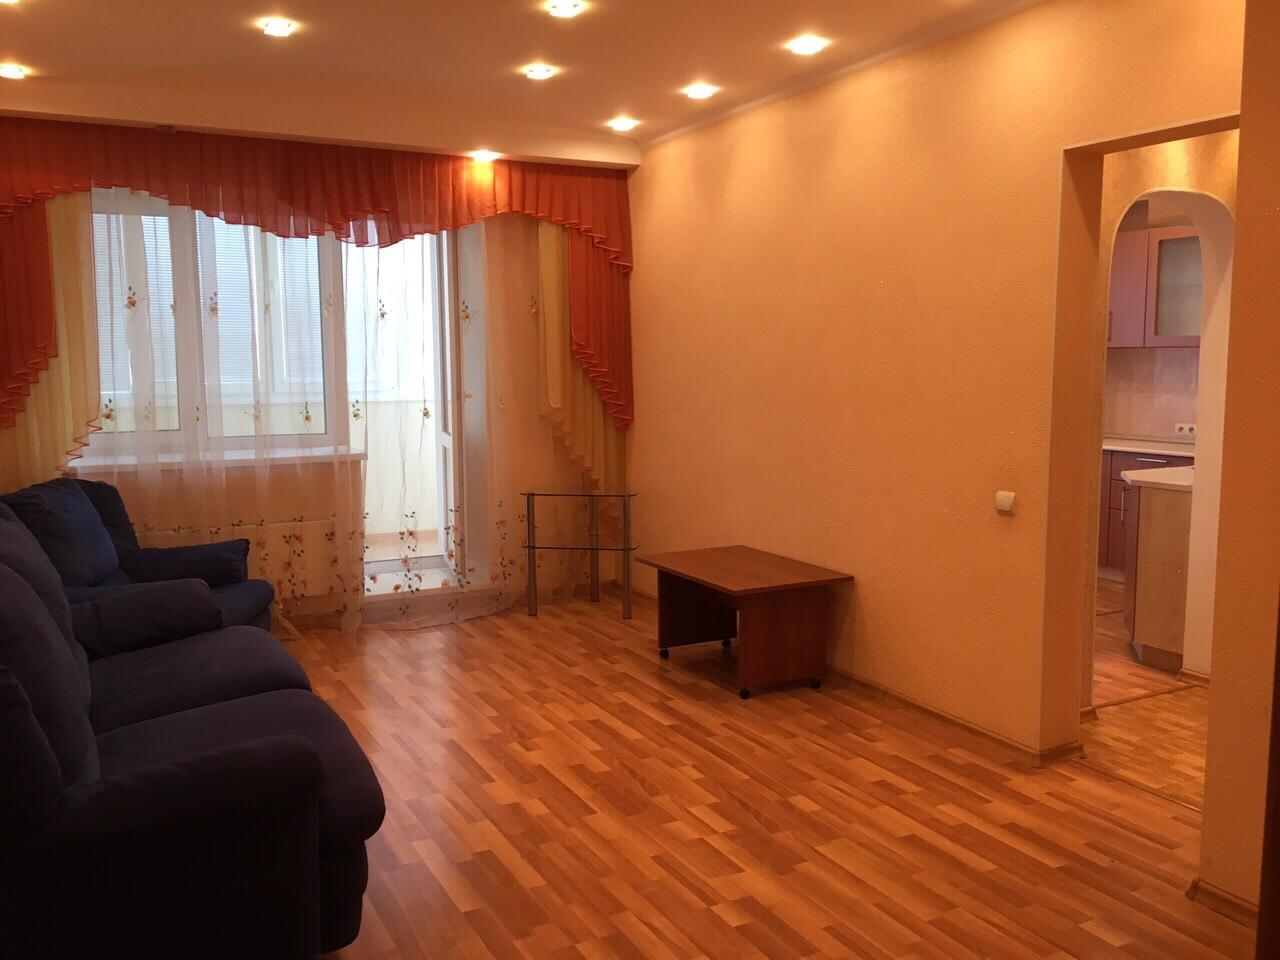 Аренда 1-комнатной квартиры, г. Тольятти, Маршала Жукова улица  дом 40б